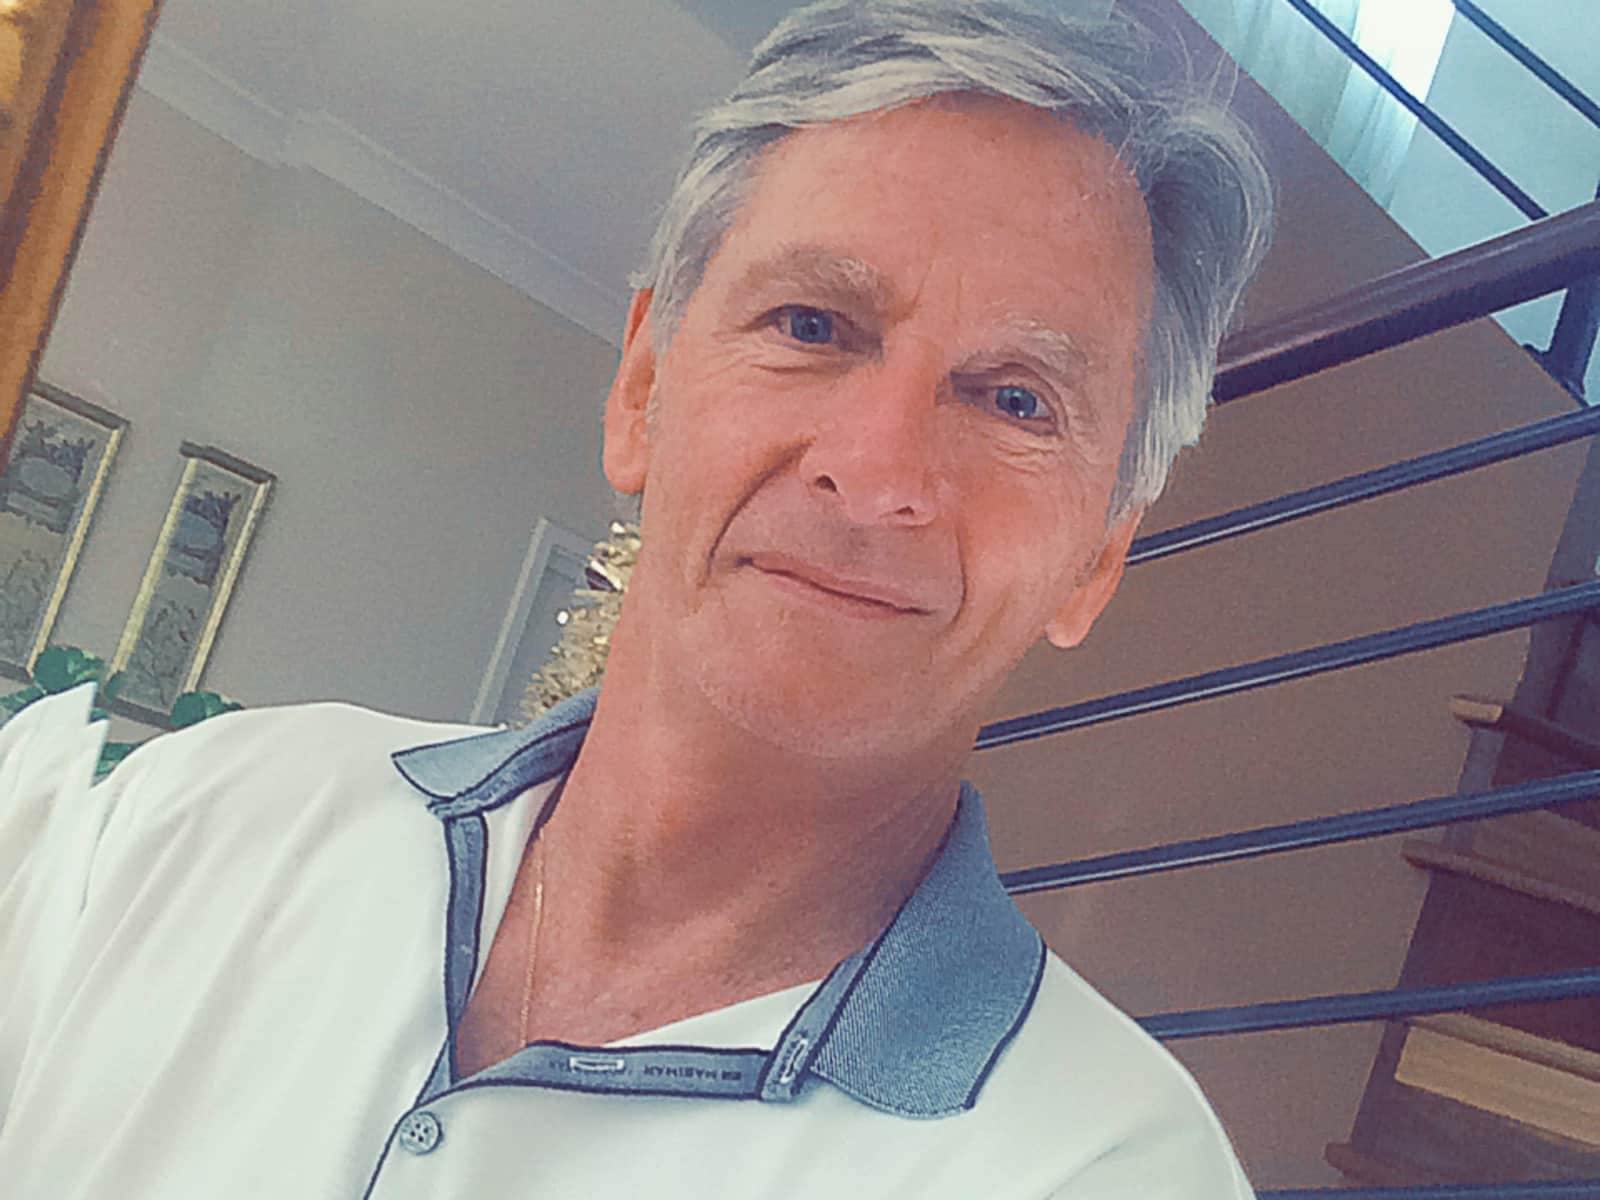 Ian from Perth, Western Australia, Australia